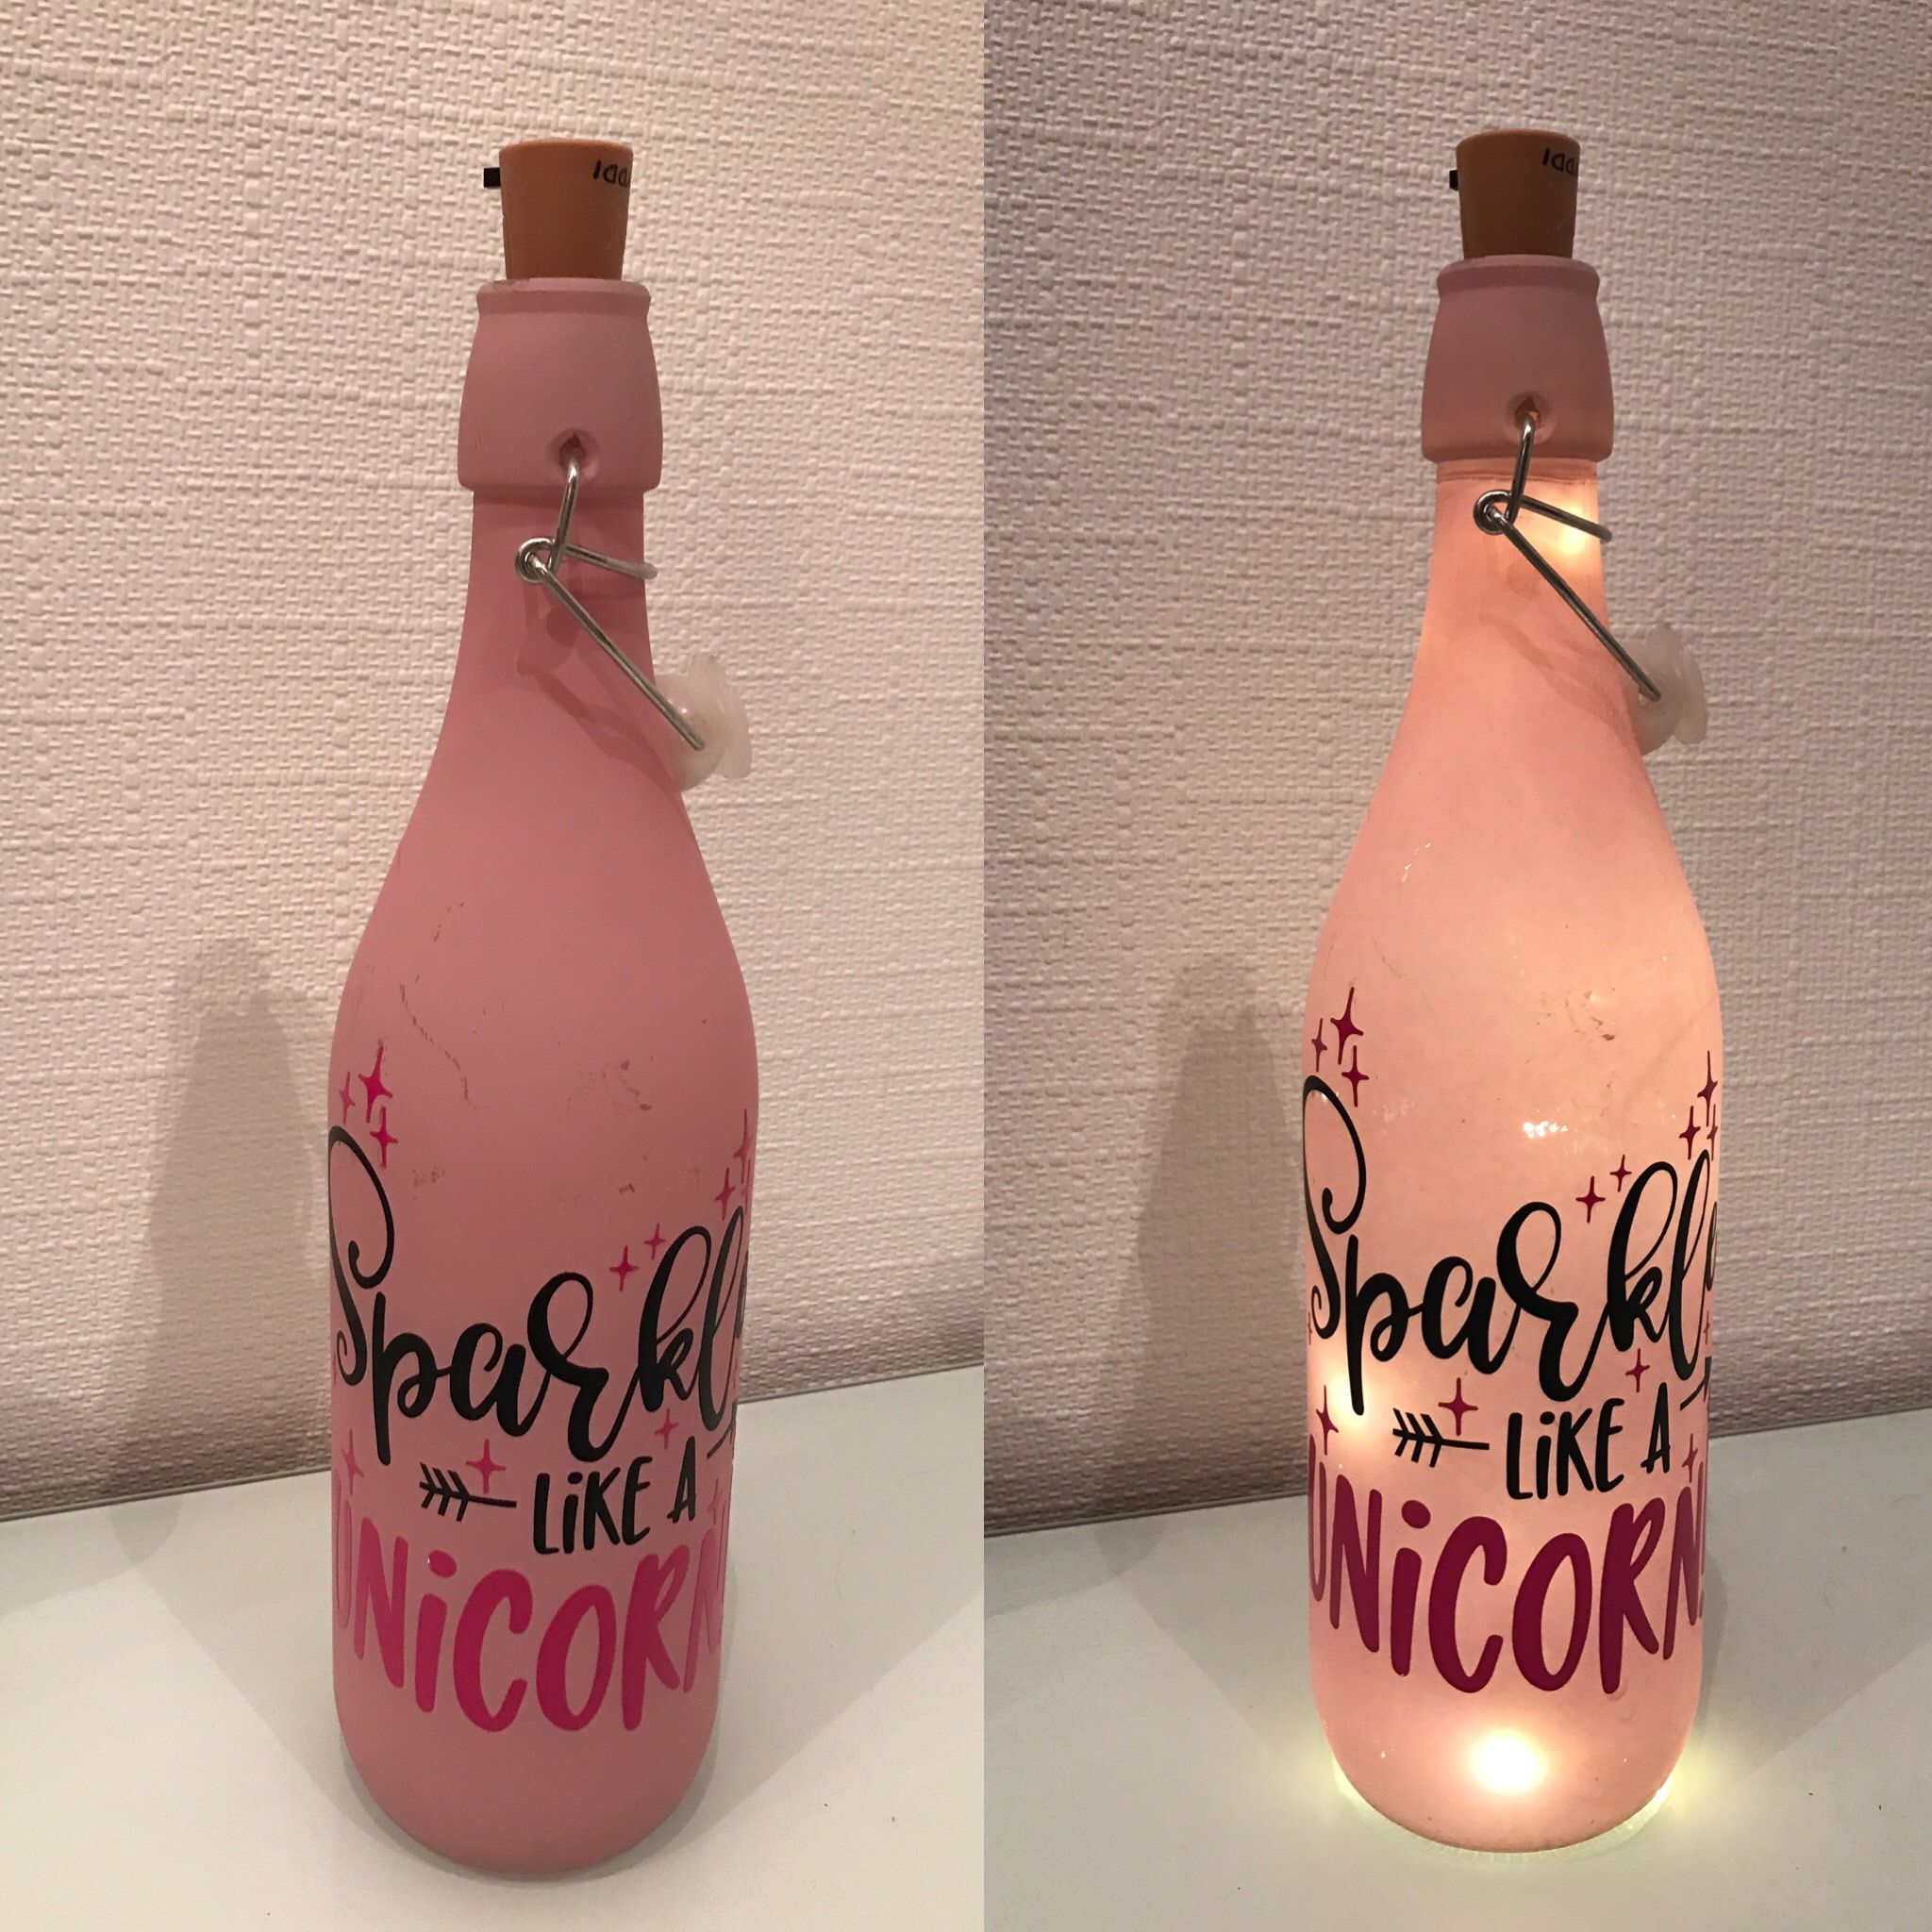 Beleuchtete Flasche Flaschenlampr Plotter Sparkle like a Unicorn ...